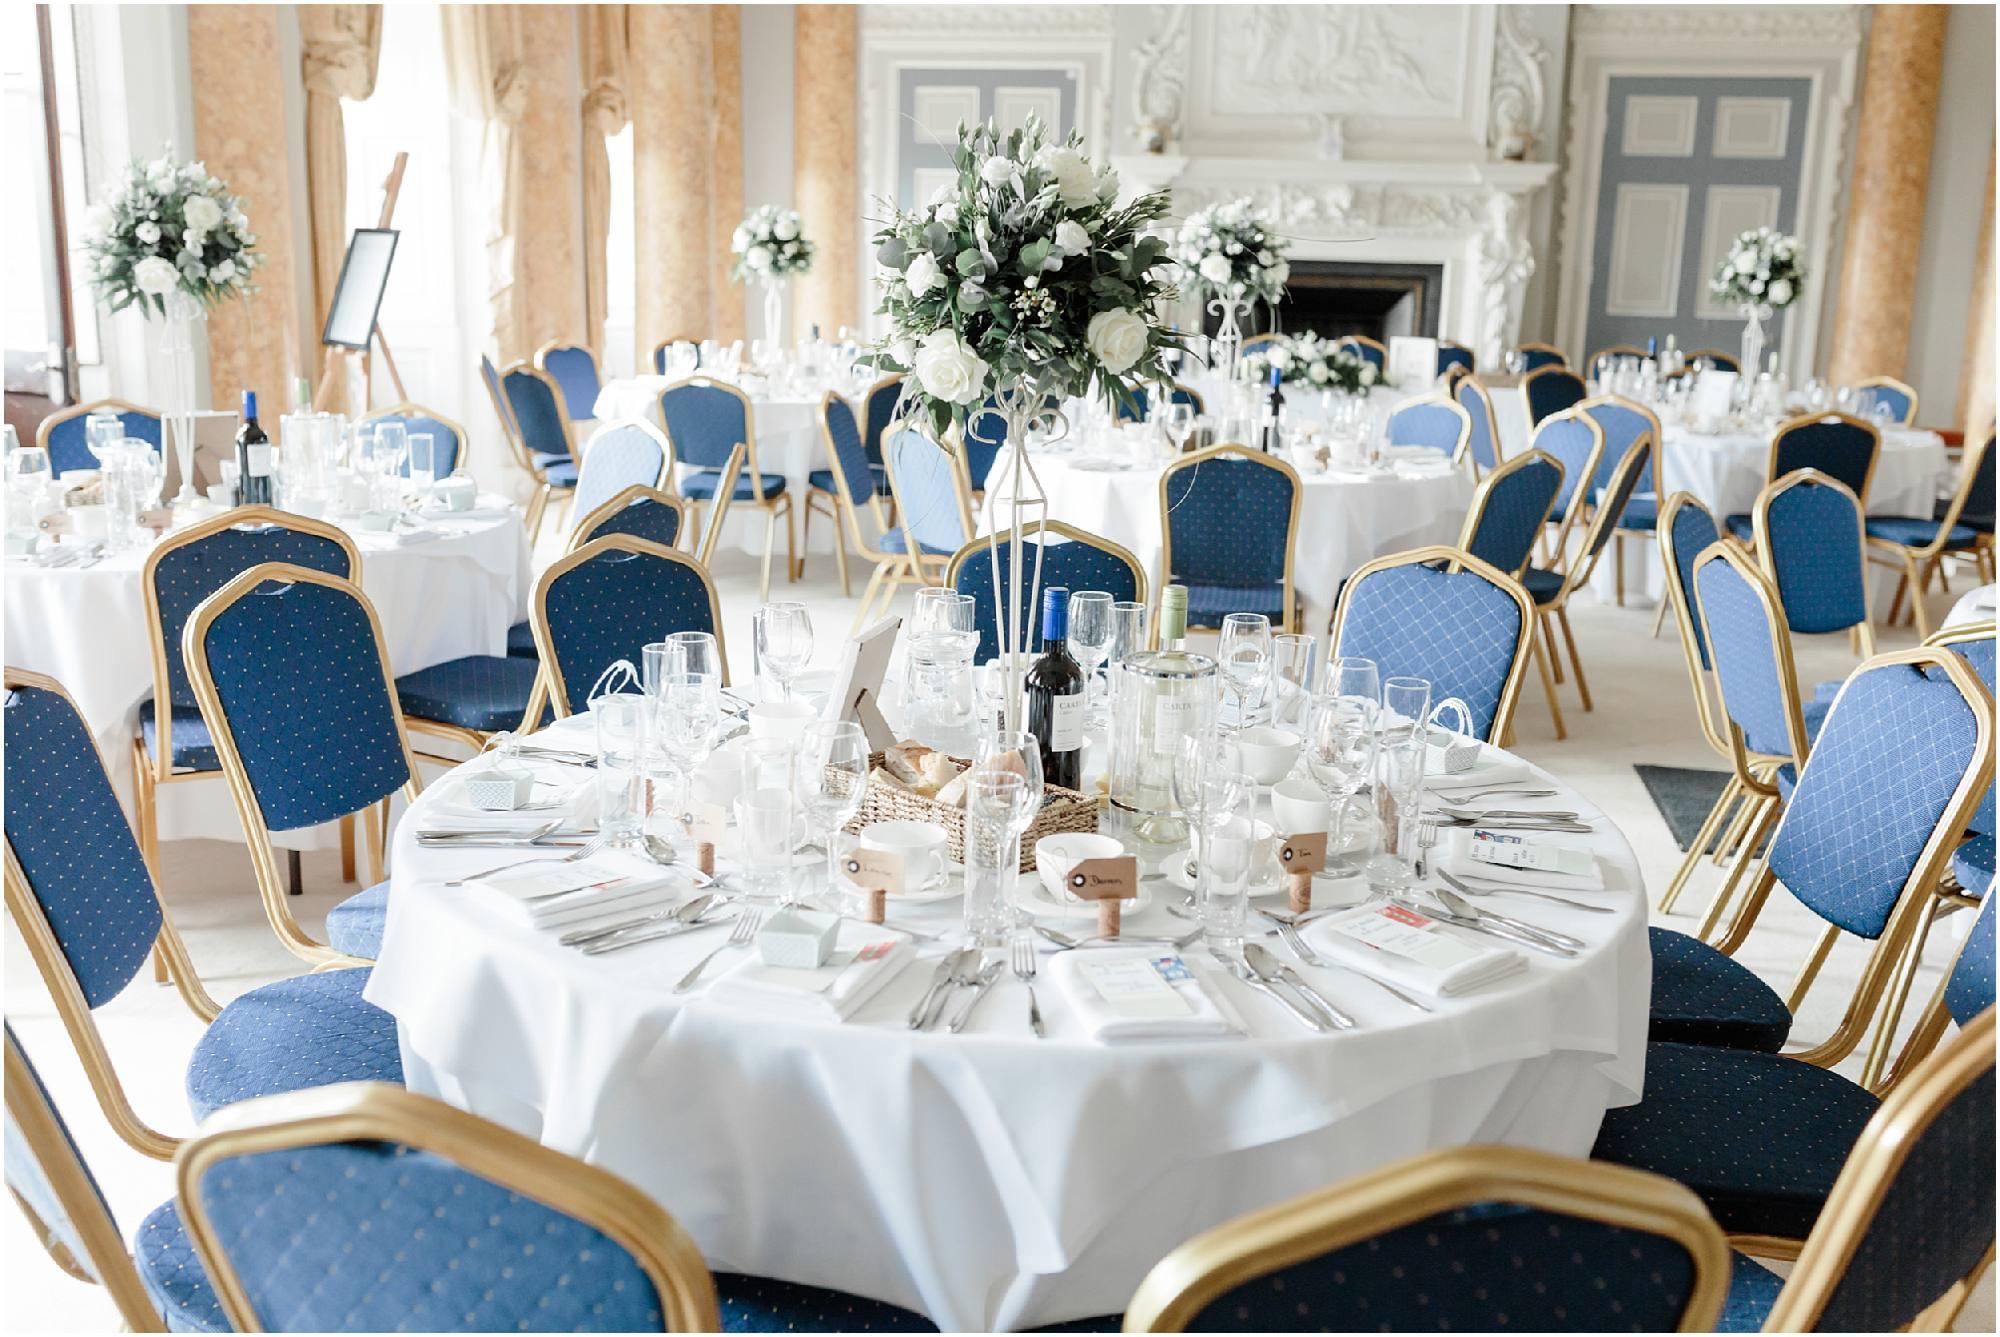 Stoneleigh Abbey Weddings